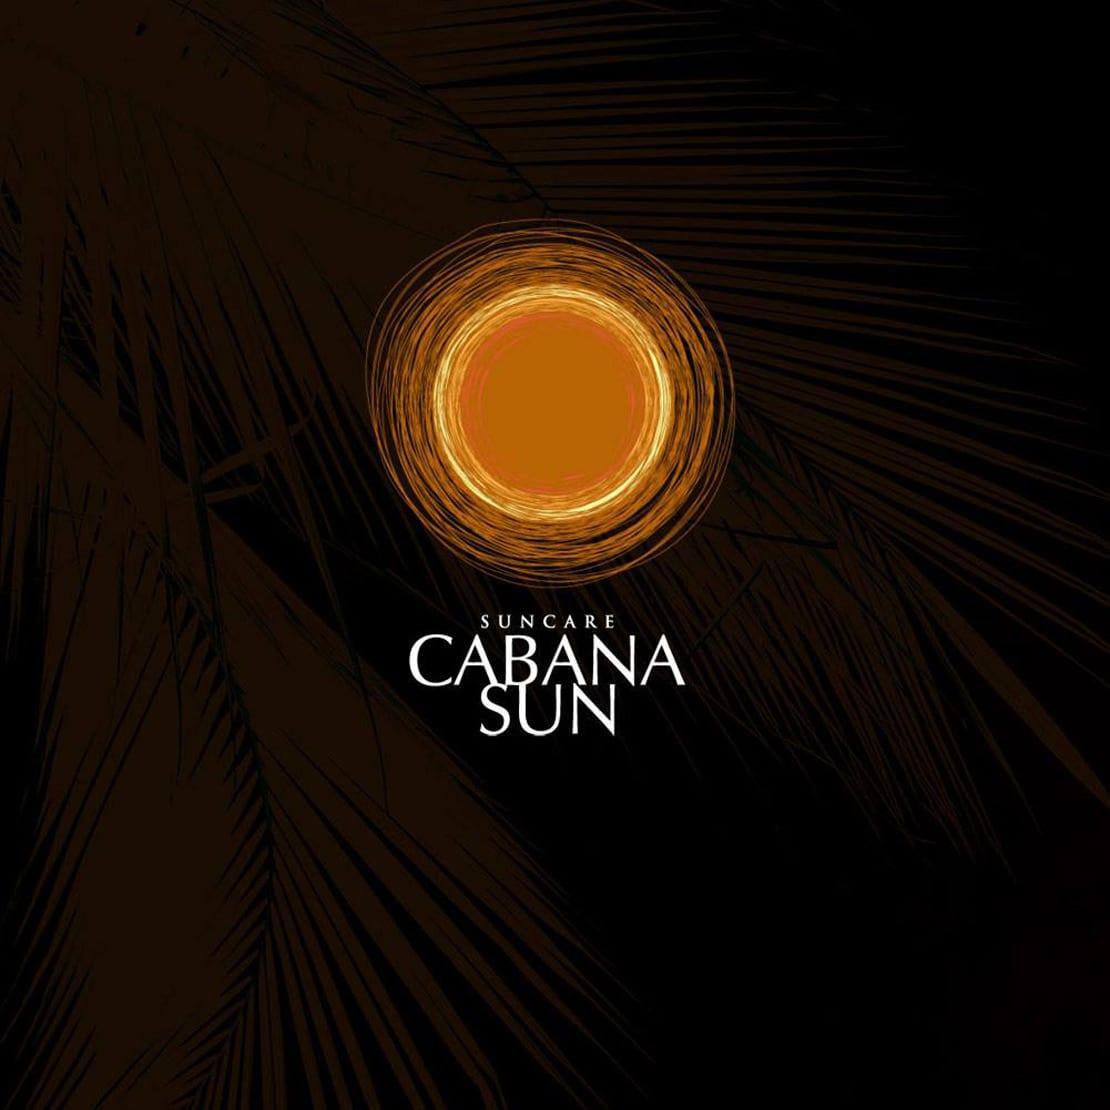 diseño de logo para cabana sun